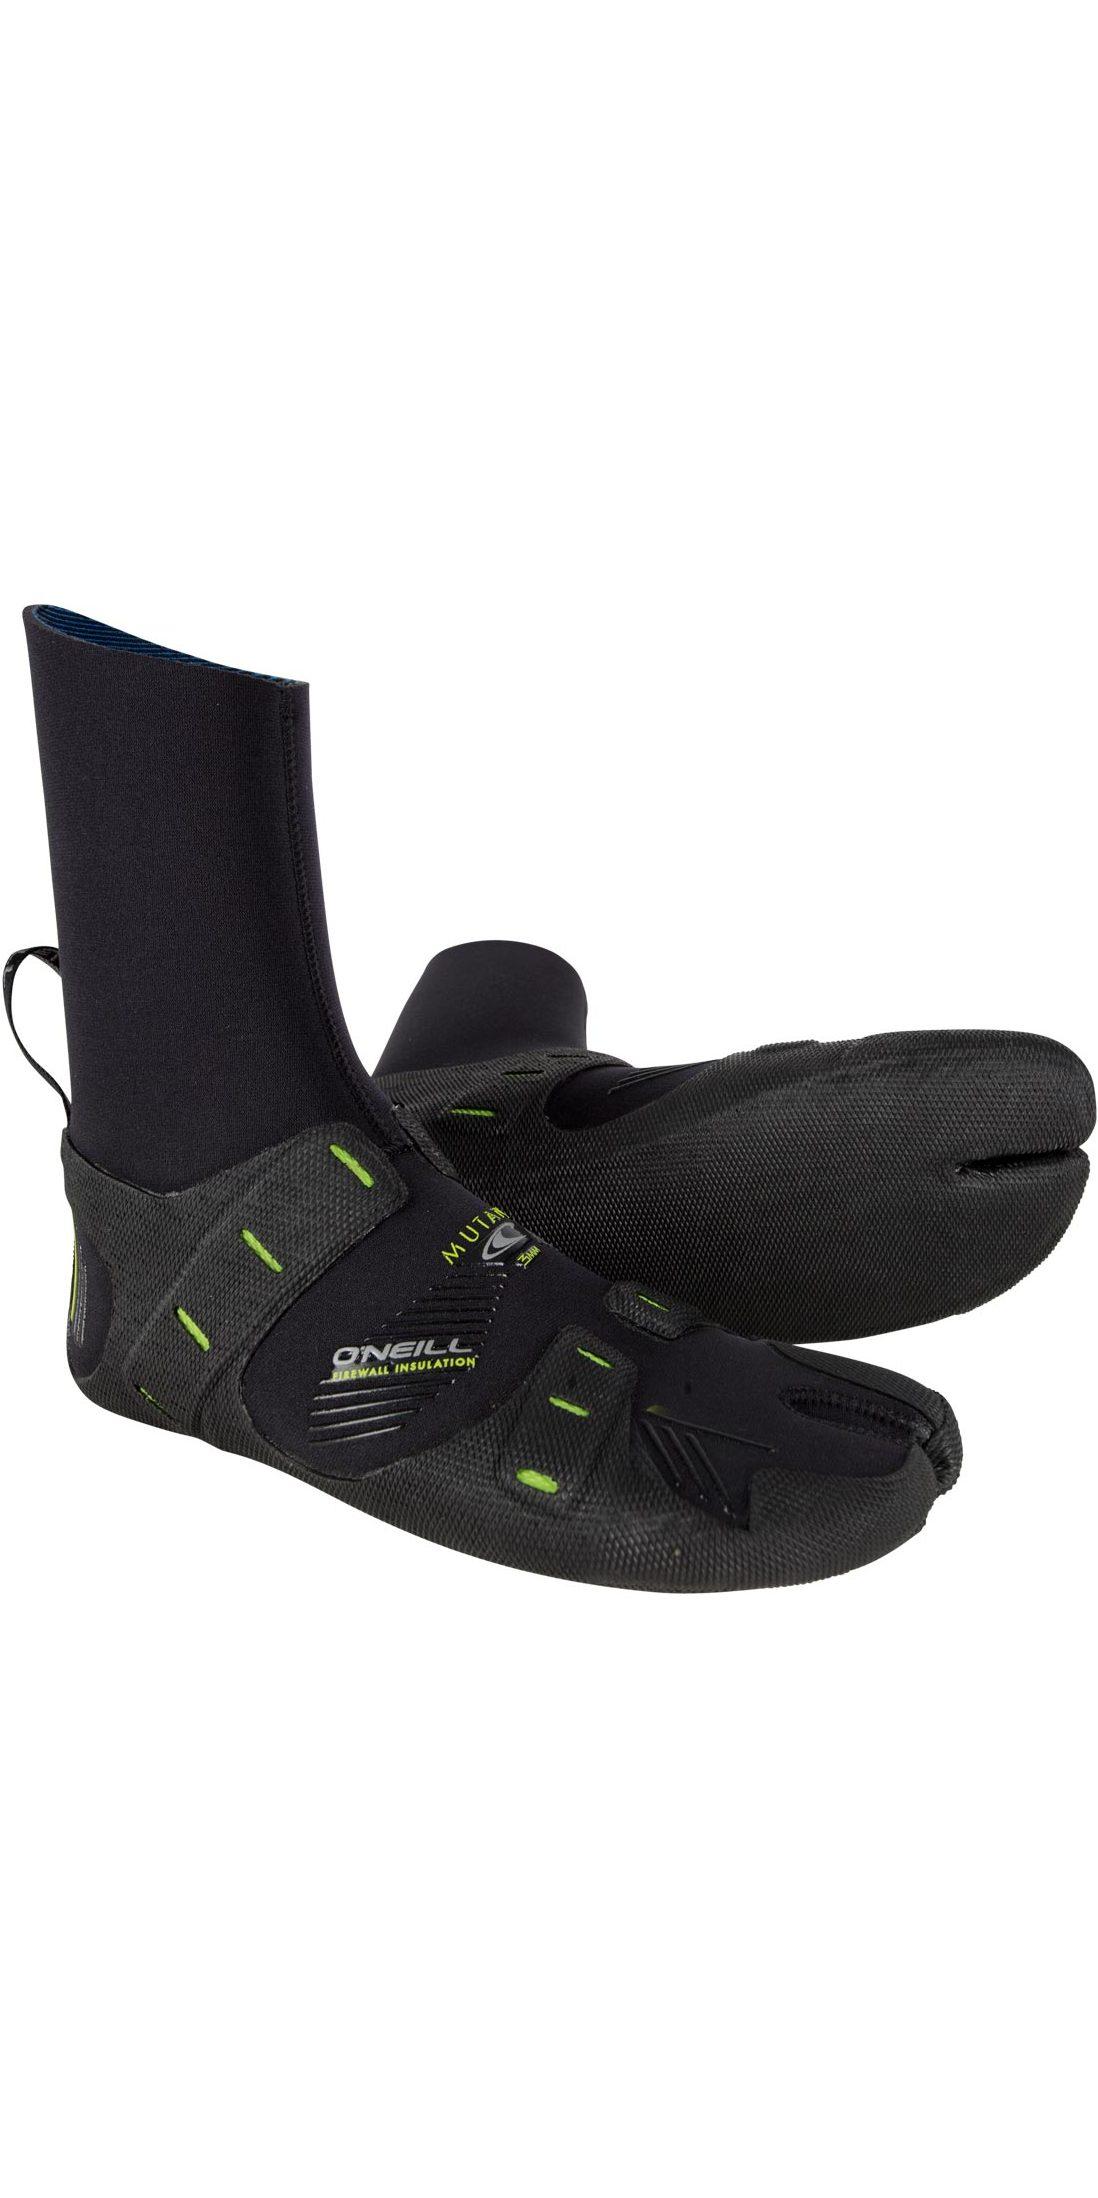 O'Neill Mutant 3mm Split Toe Boots 4793